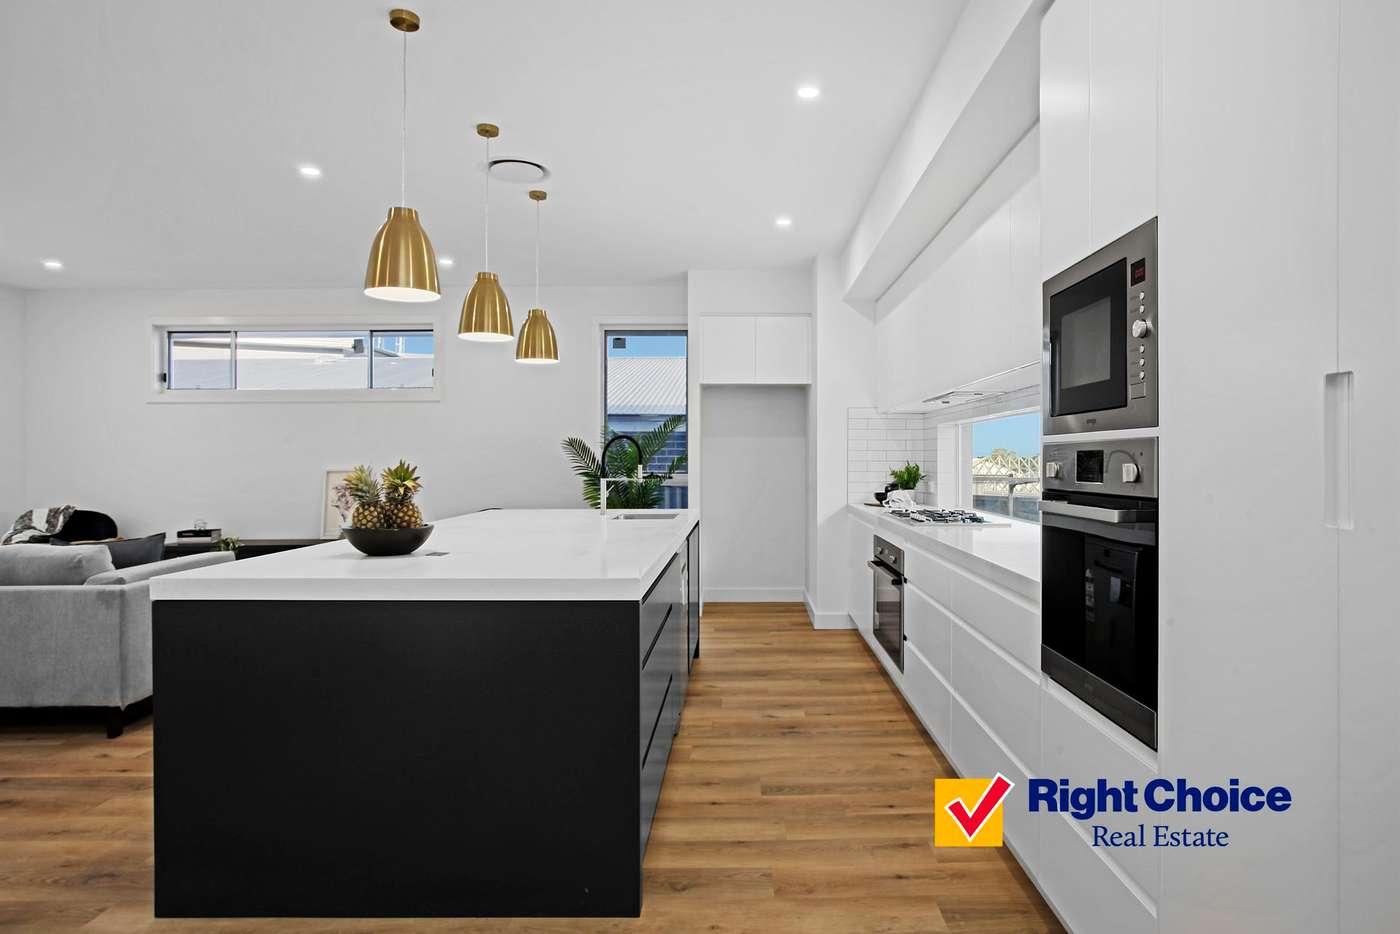 Main view of Homely house listing, 57 Saddleback Crescent, Kembla Grange NSW 2526